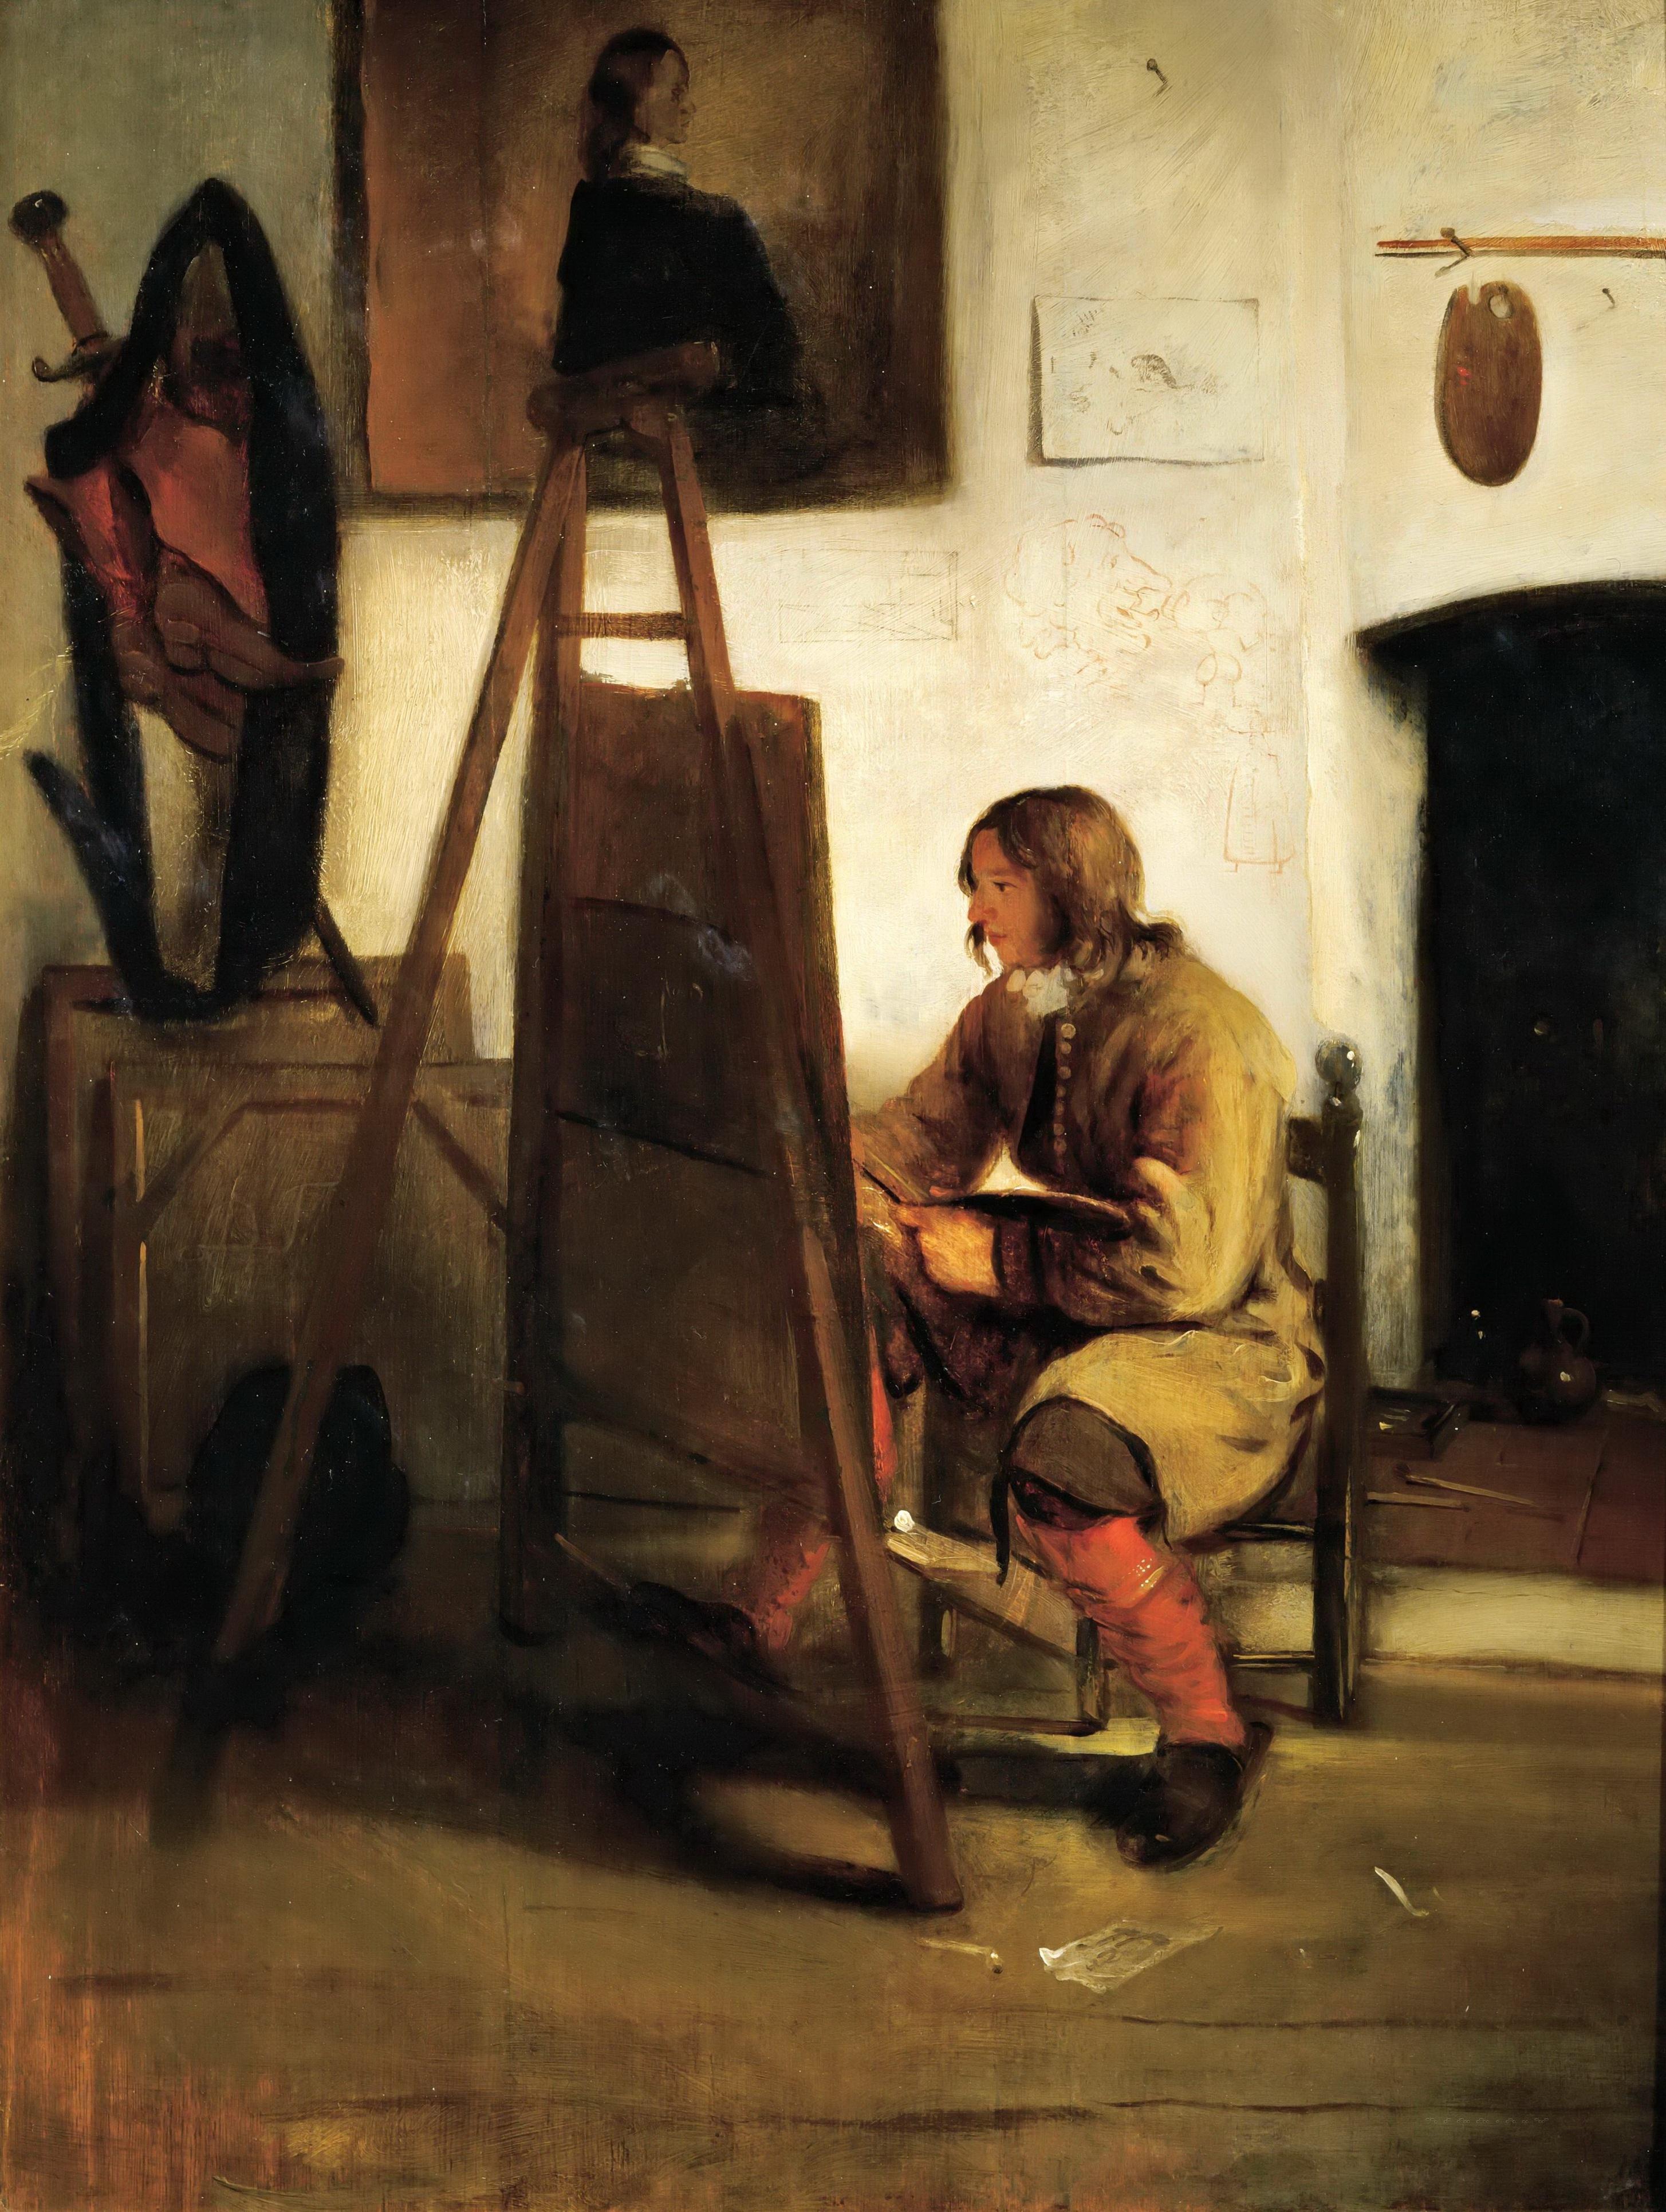 File:Barent Fabritius - Young Painter in his Studio - WGA7720.jpg